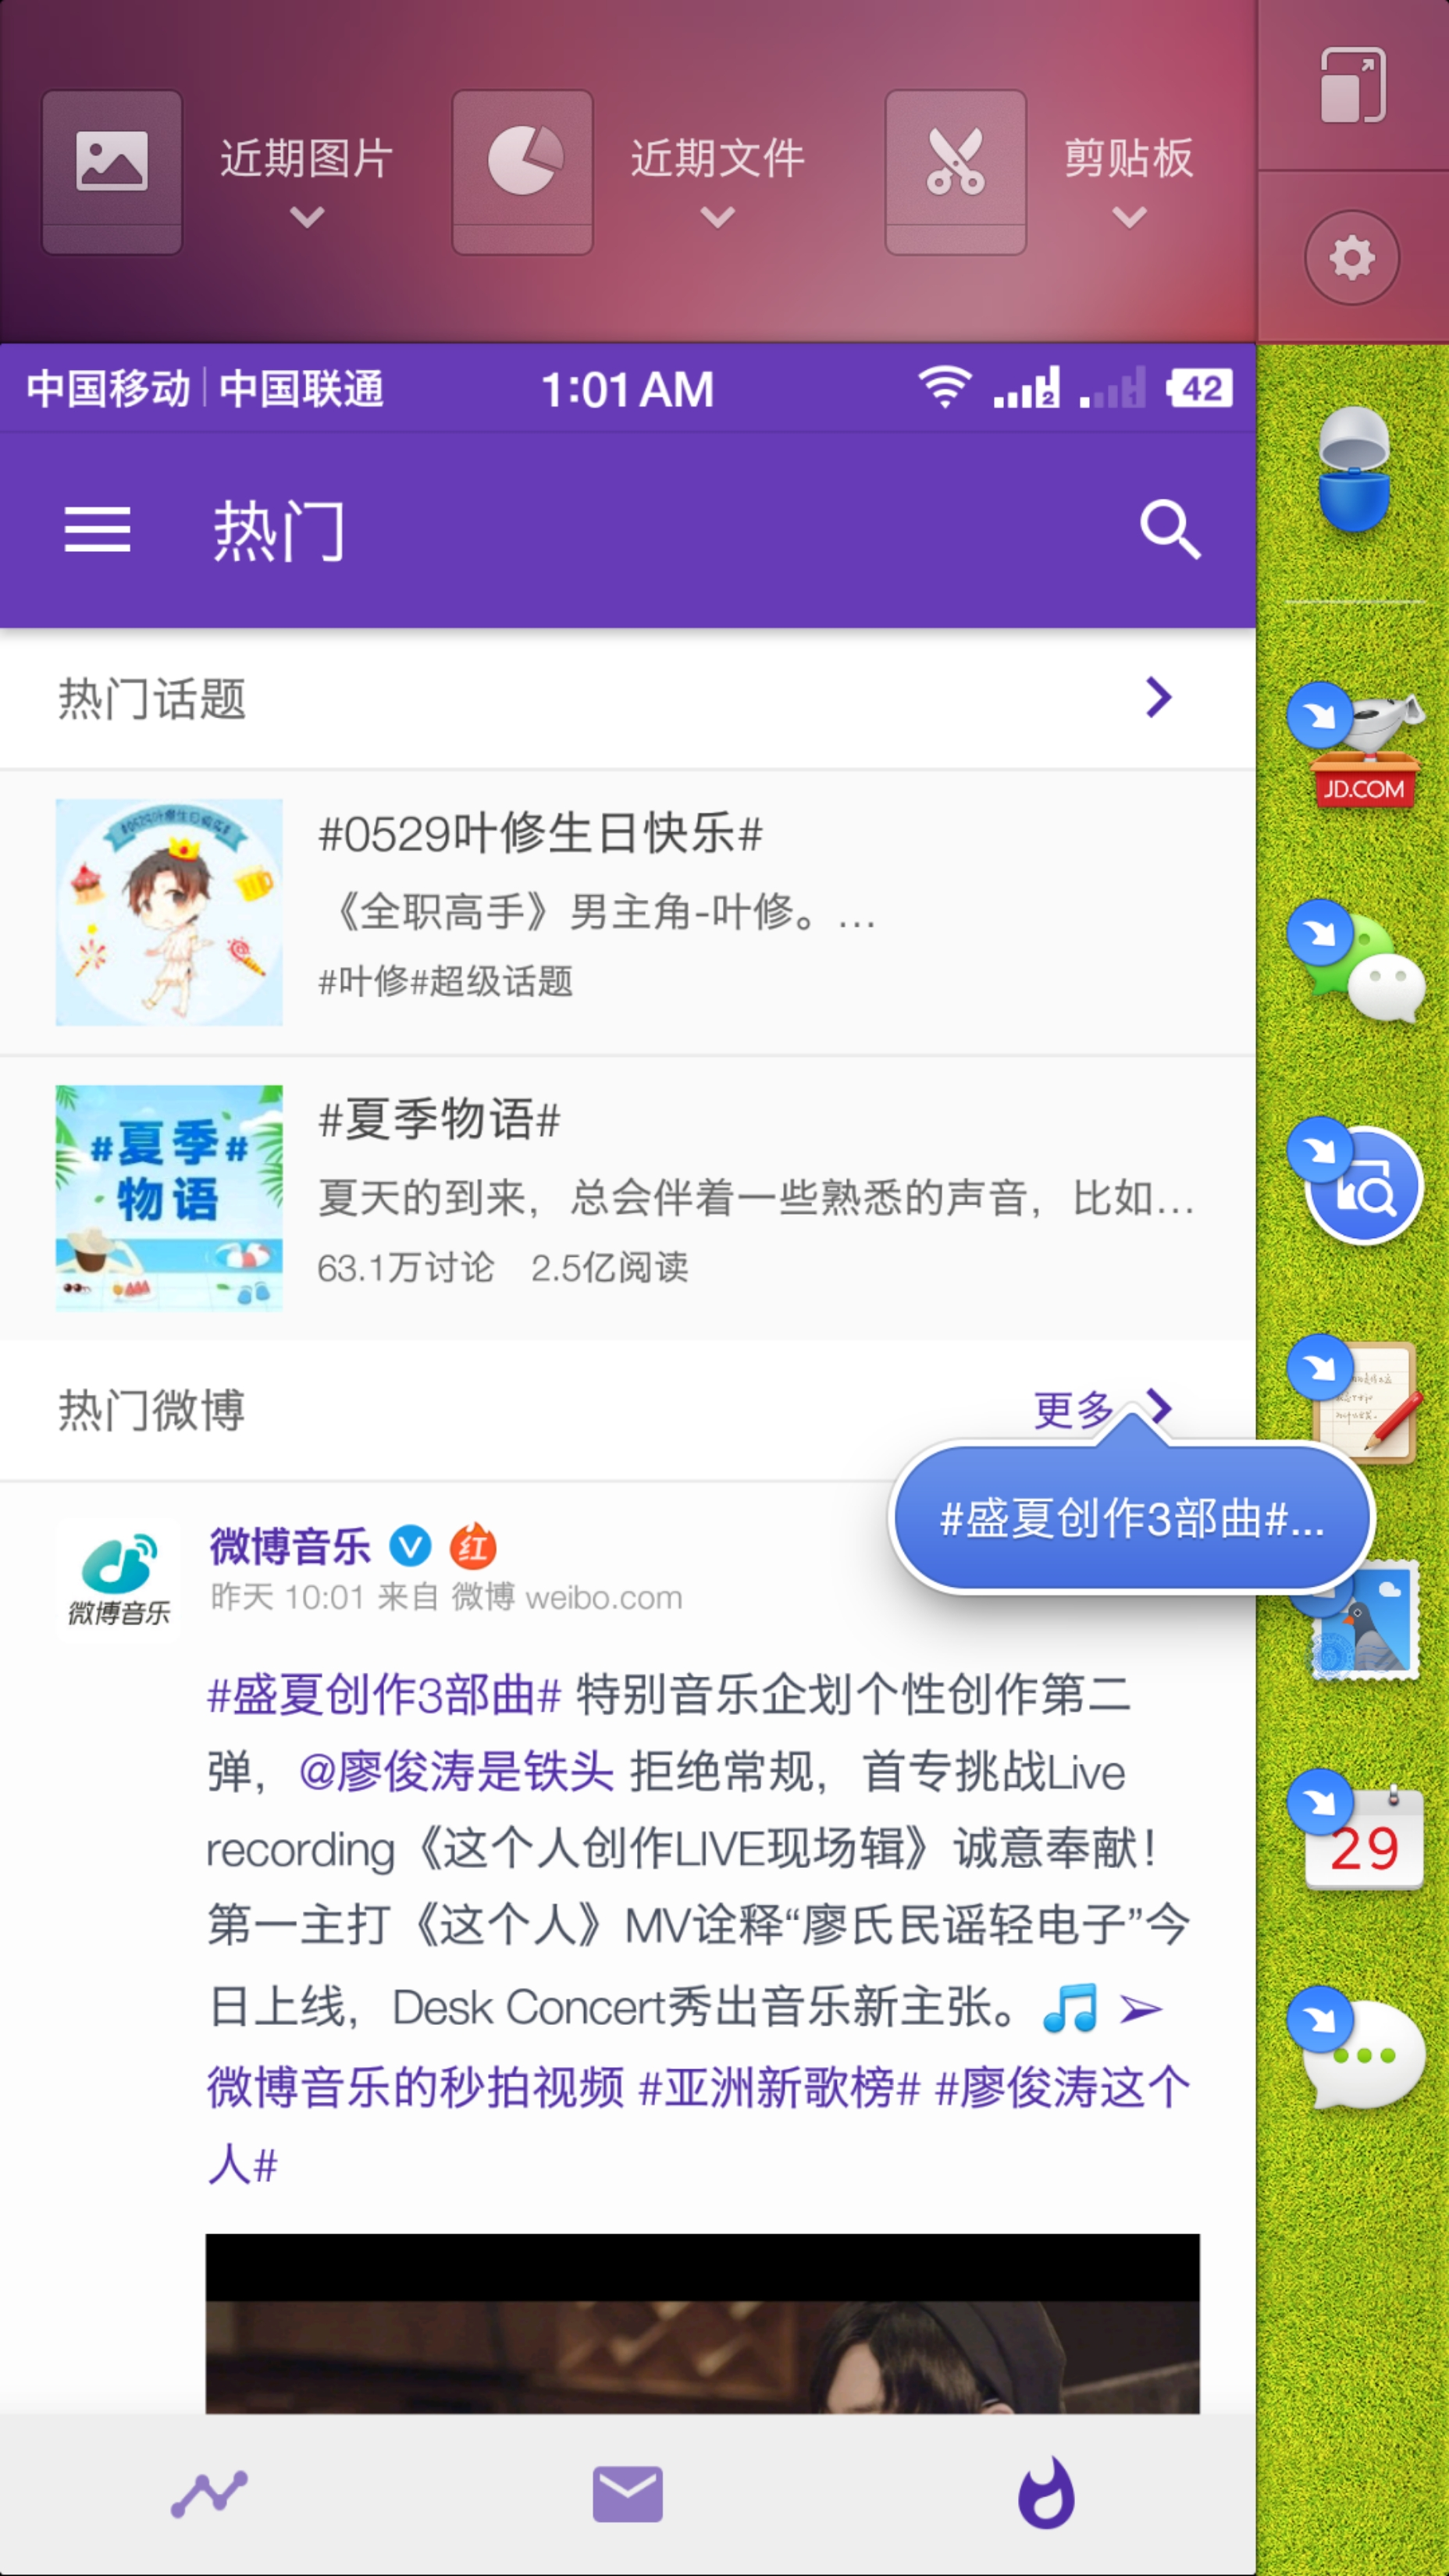 Screenshot_2018-05-29-01-01-58-471_Share.png